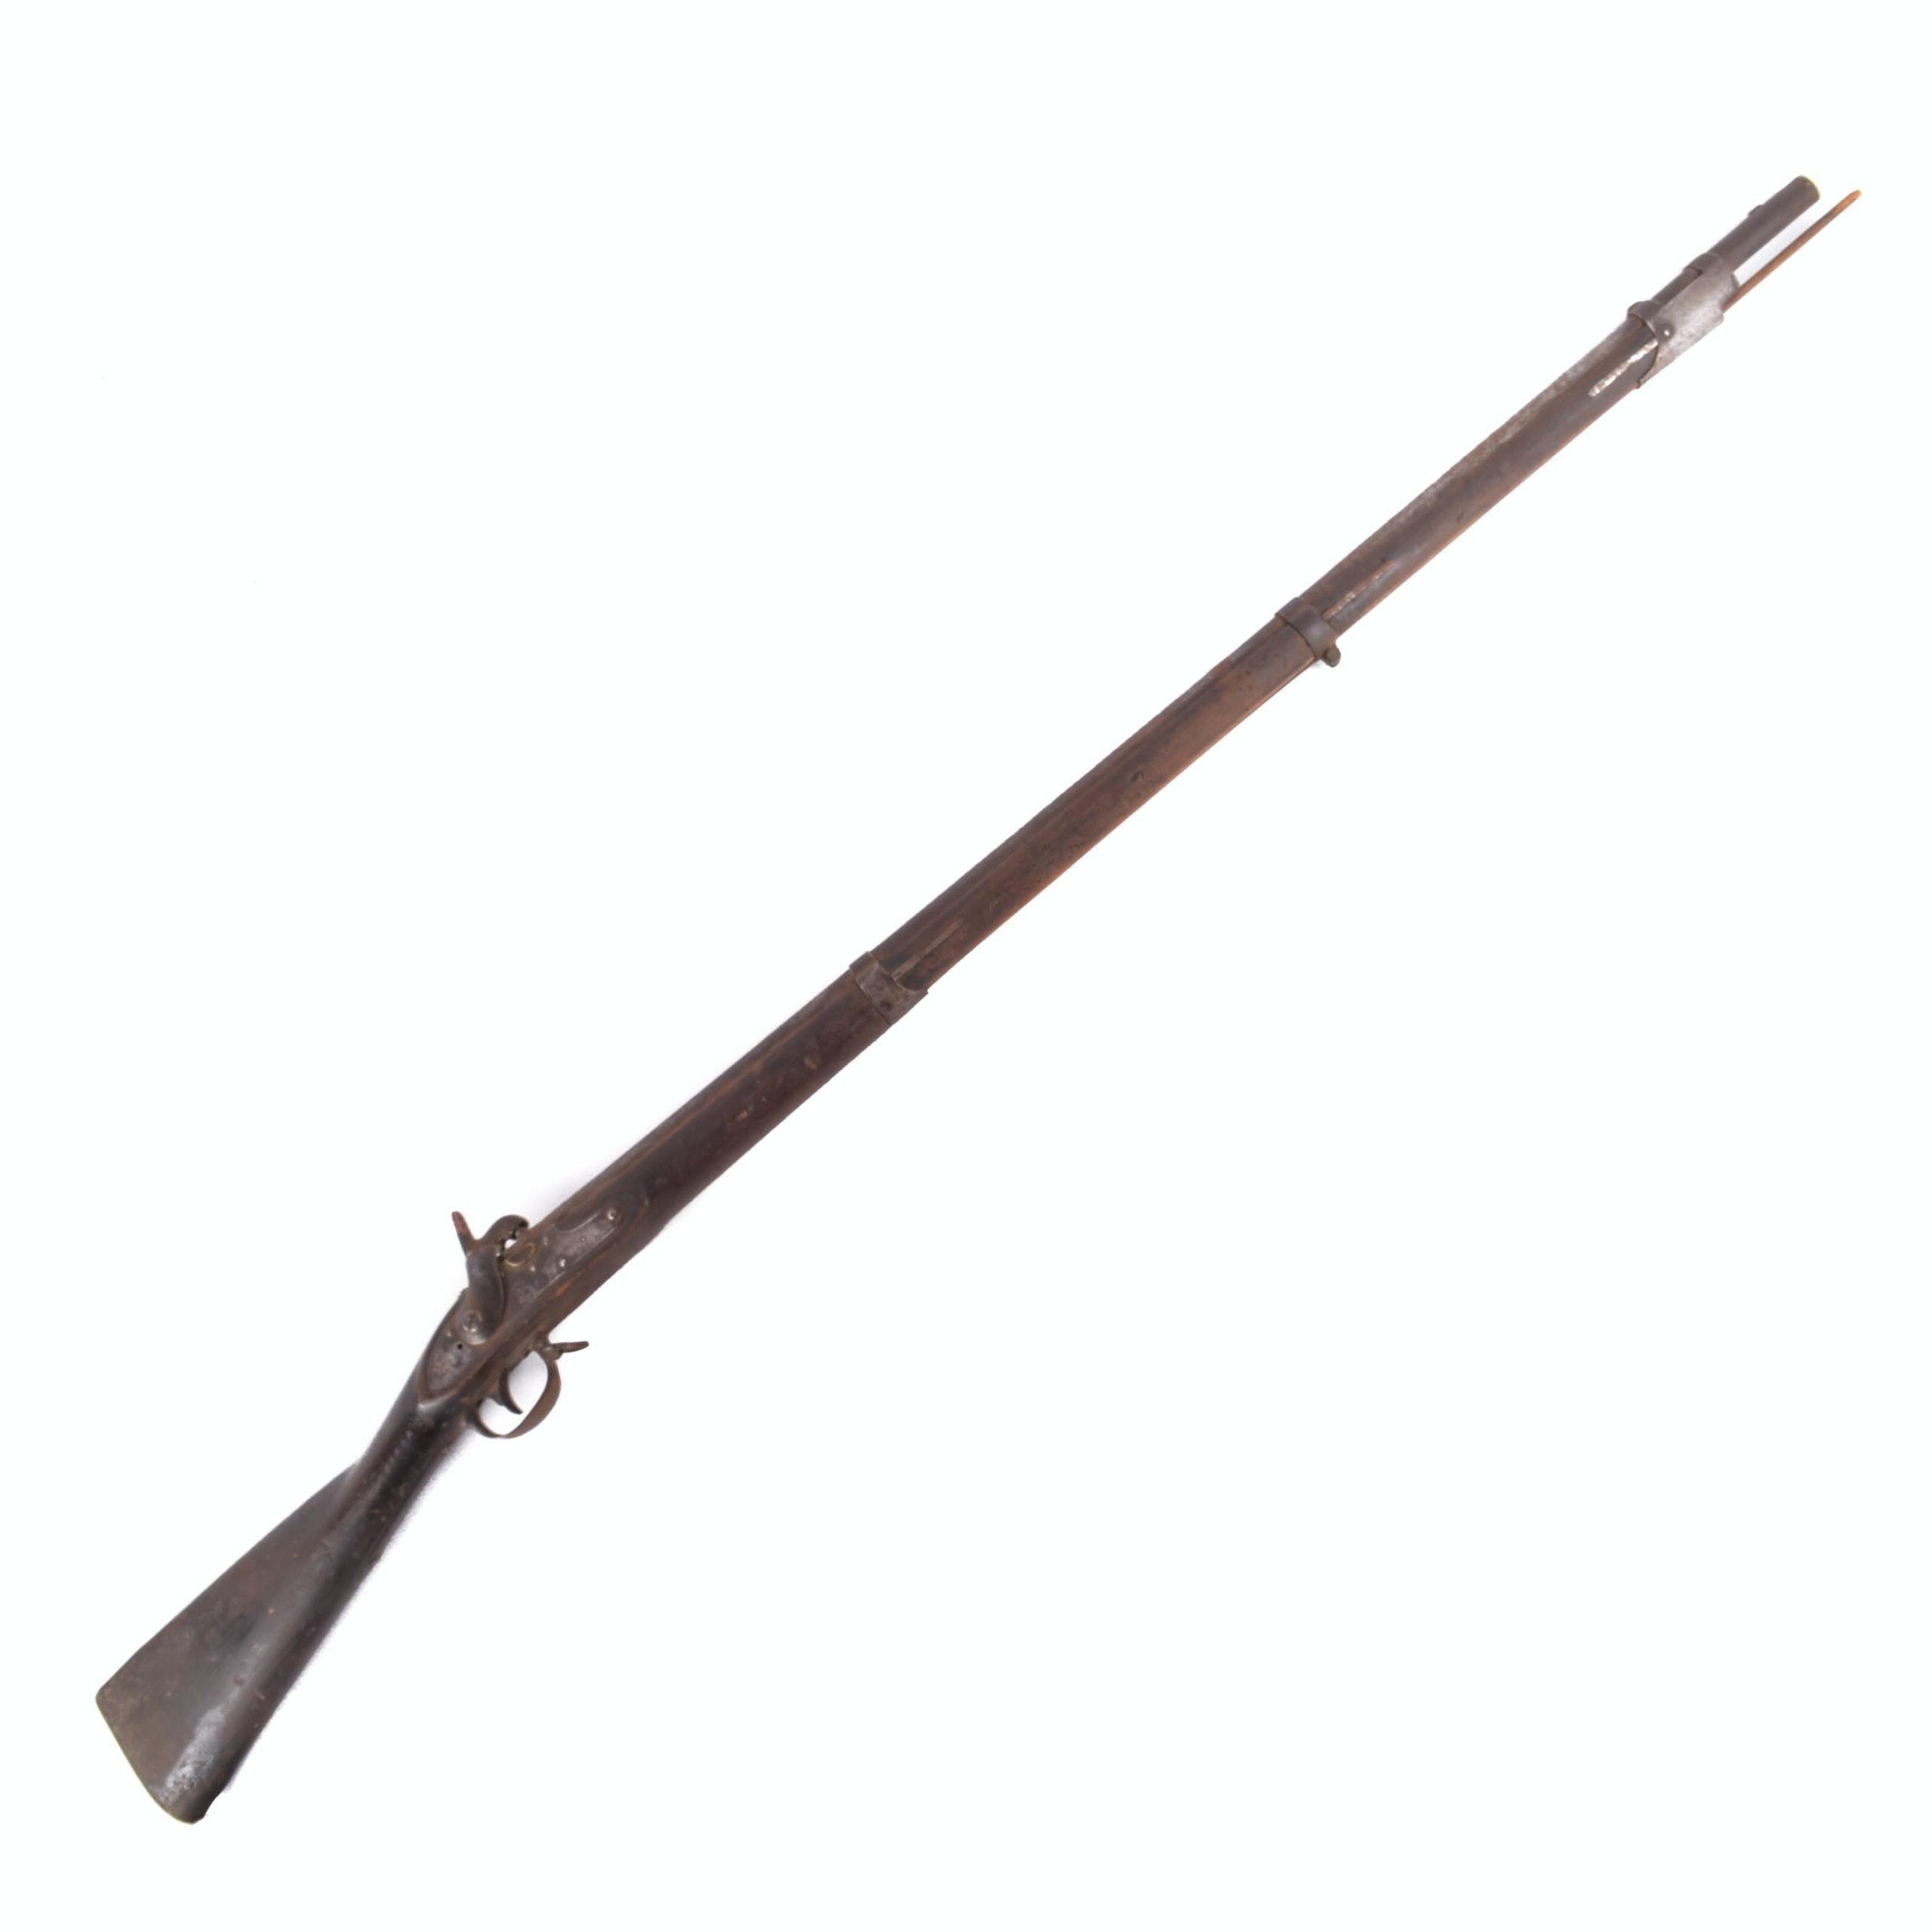 Antique Springfield Rifle Model 1825